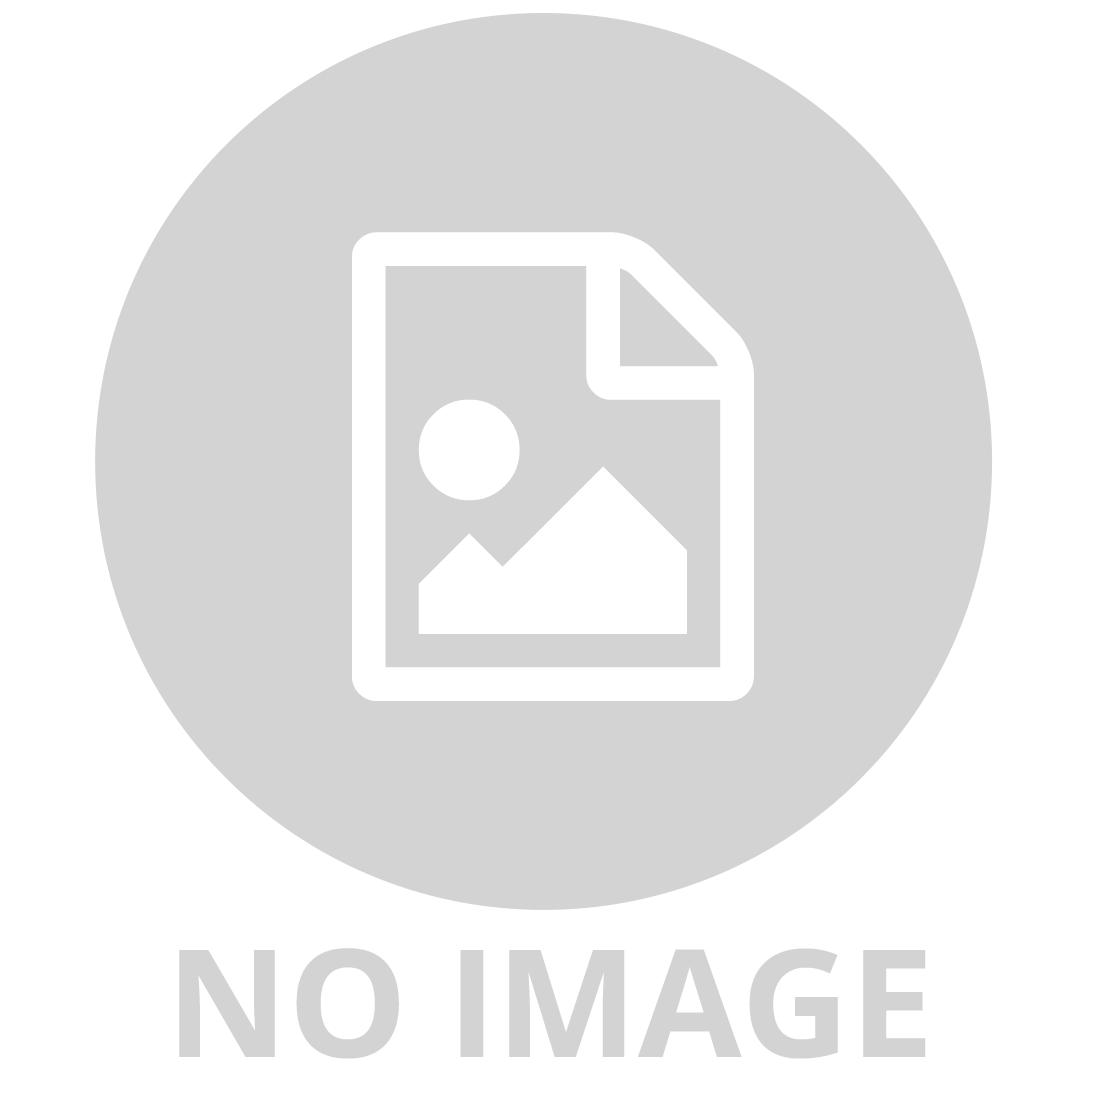 MONARCH STEEL HOT ROD PEDAL CAR